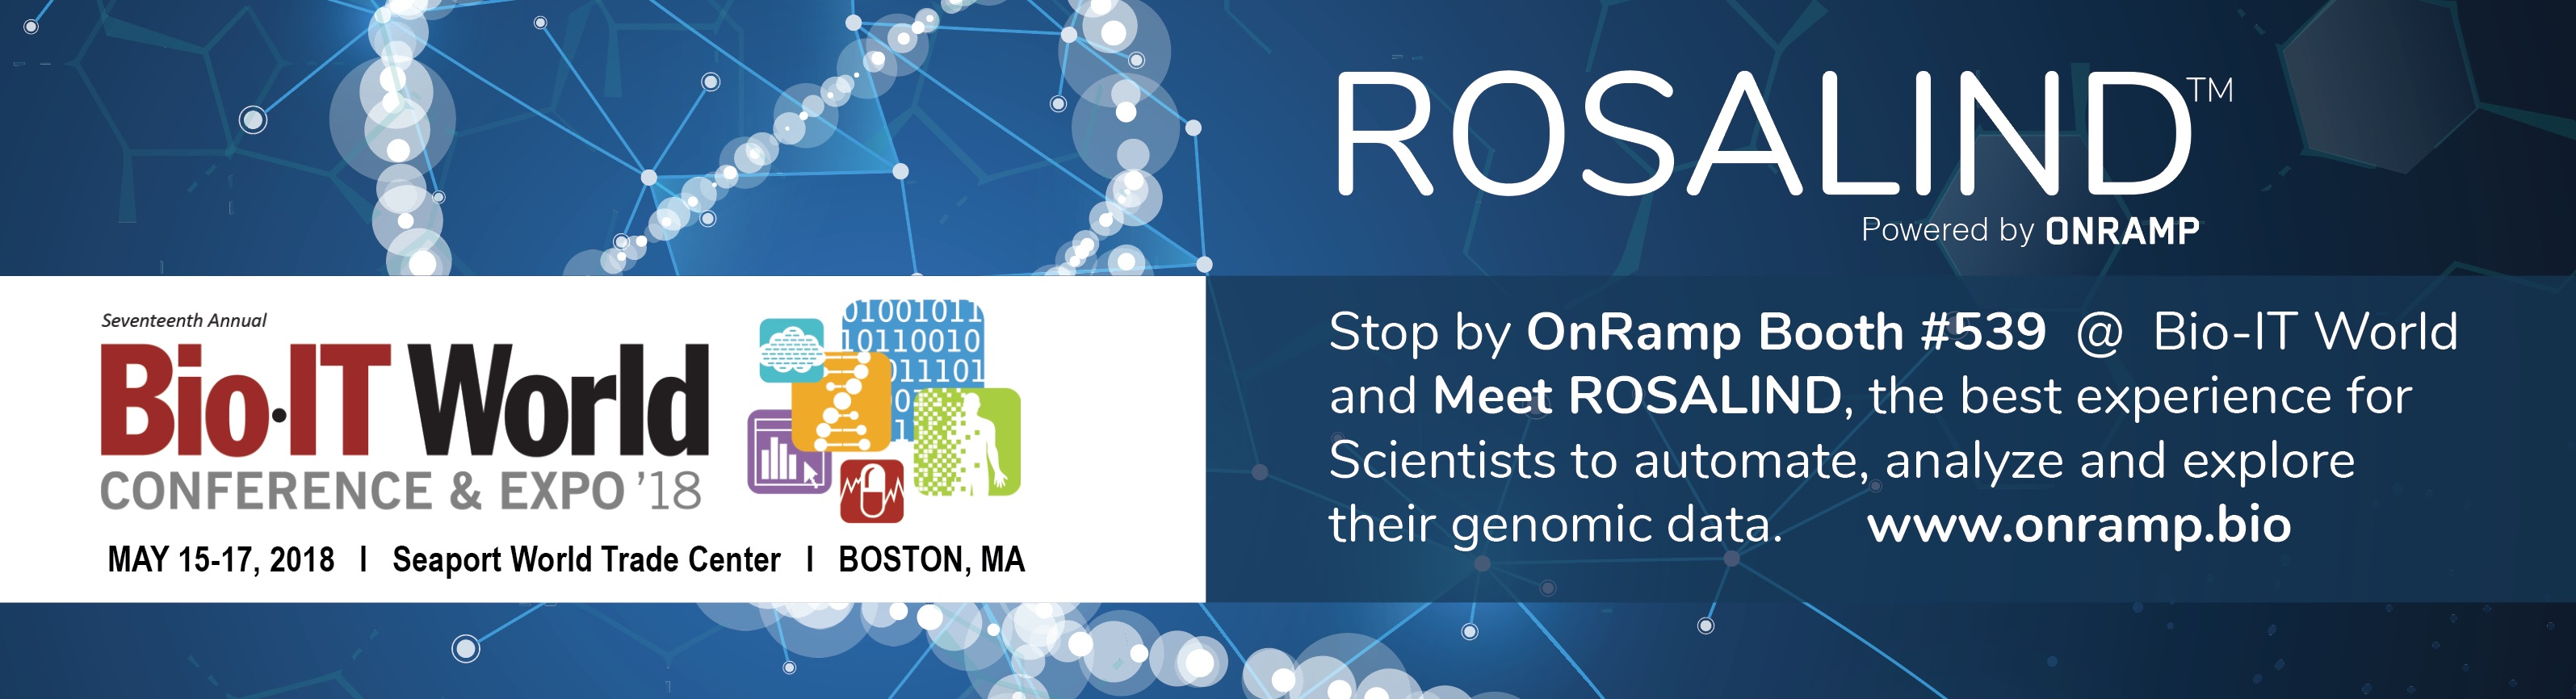 Come See ROSALIND at Bio-IT World 2018